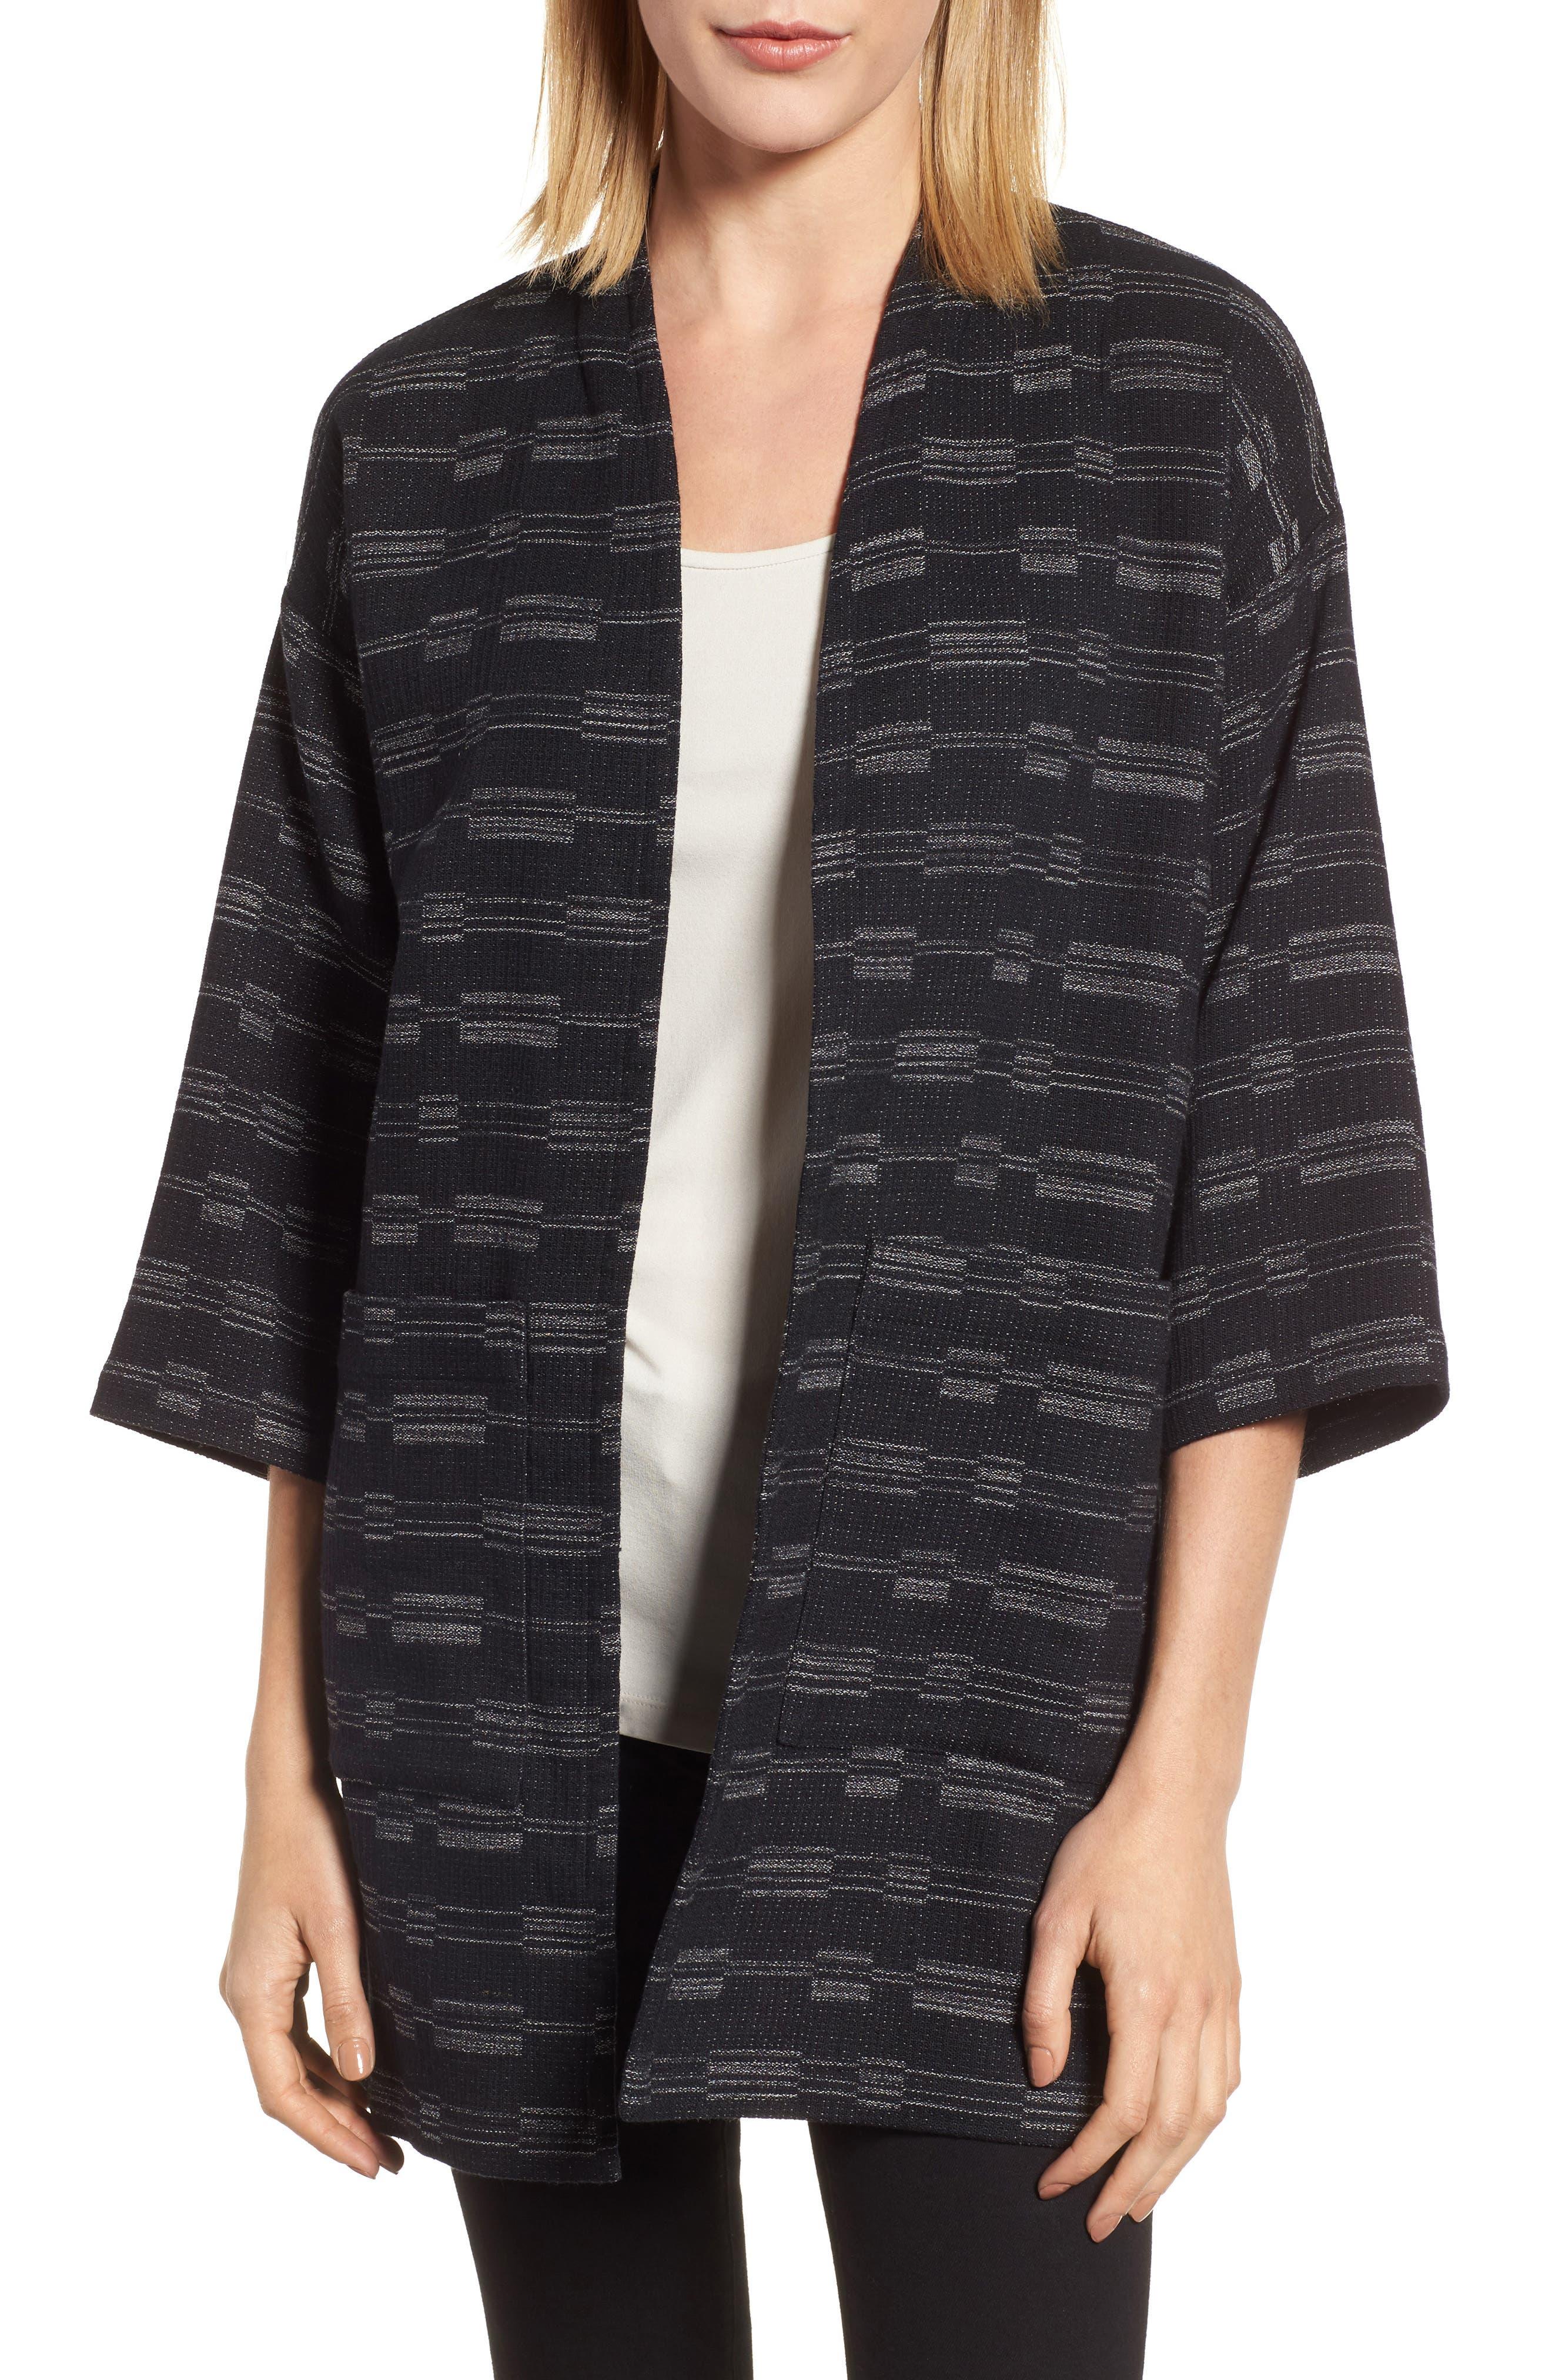 Organic Cotton Blend Tweed Jacket,                             Main thumbnail 1, color,                             001